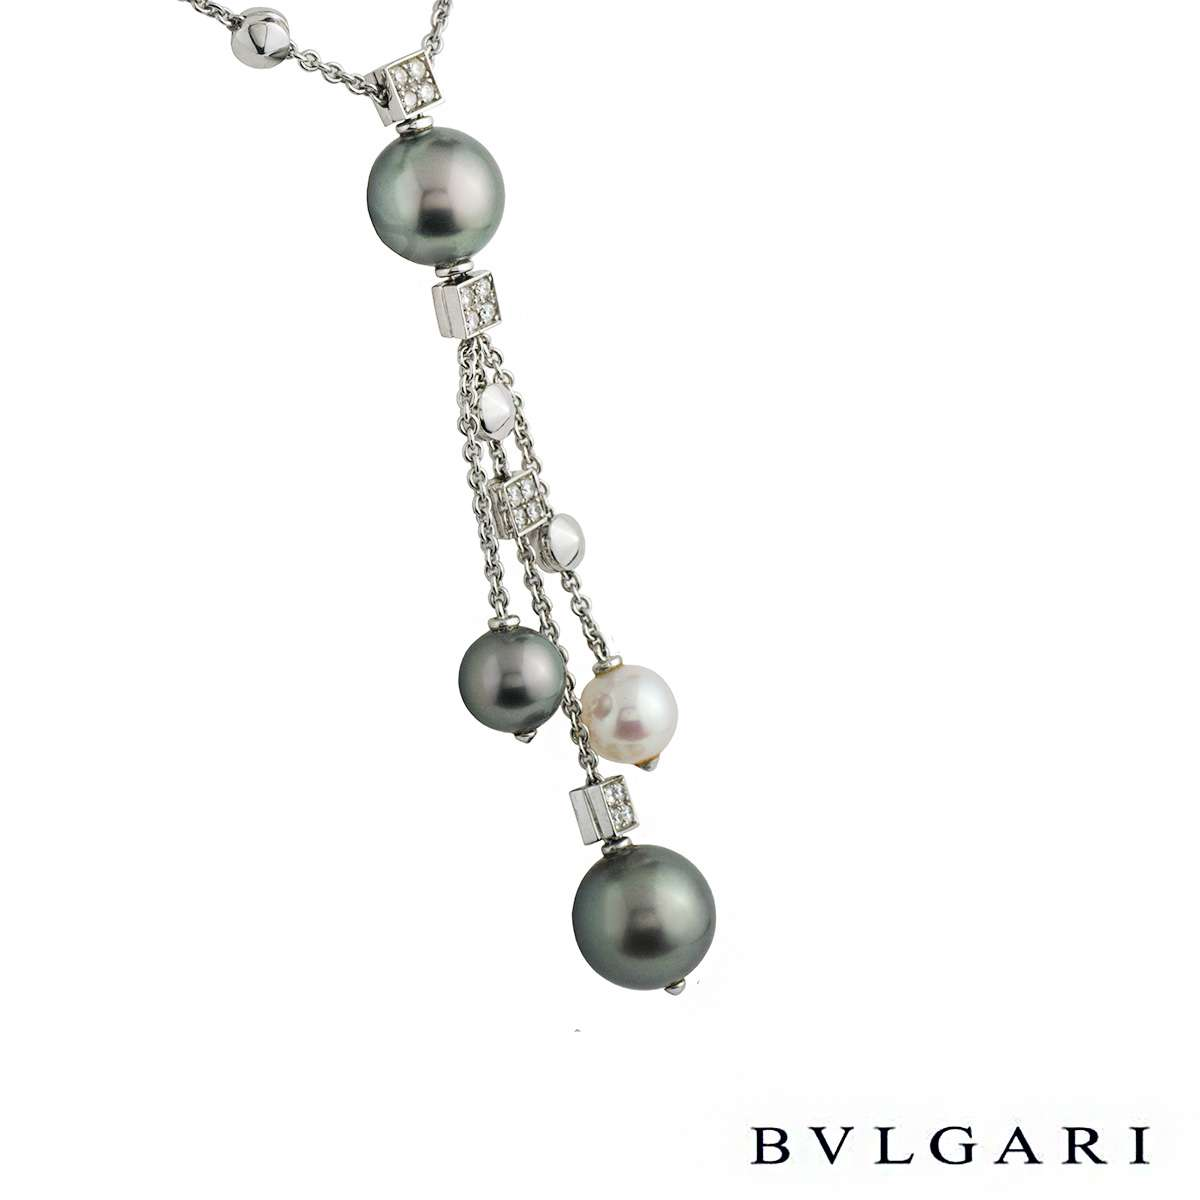 Bvlgari Lucea Diamond & Pearl Necklace